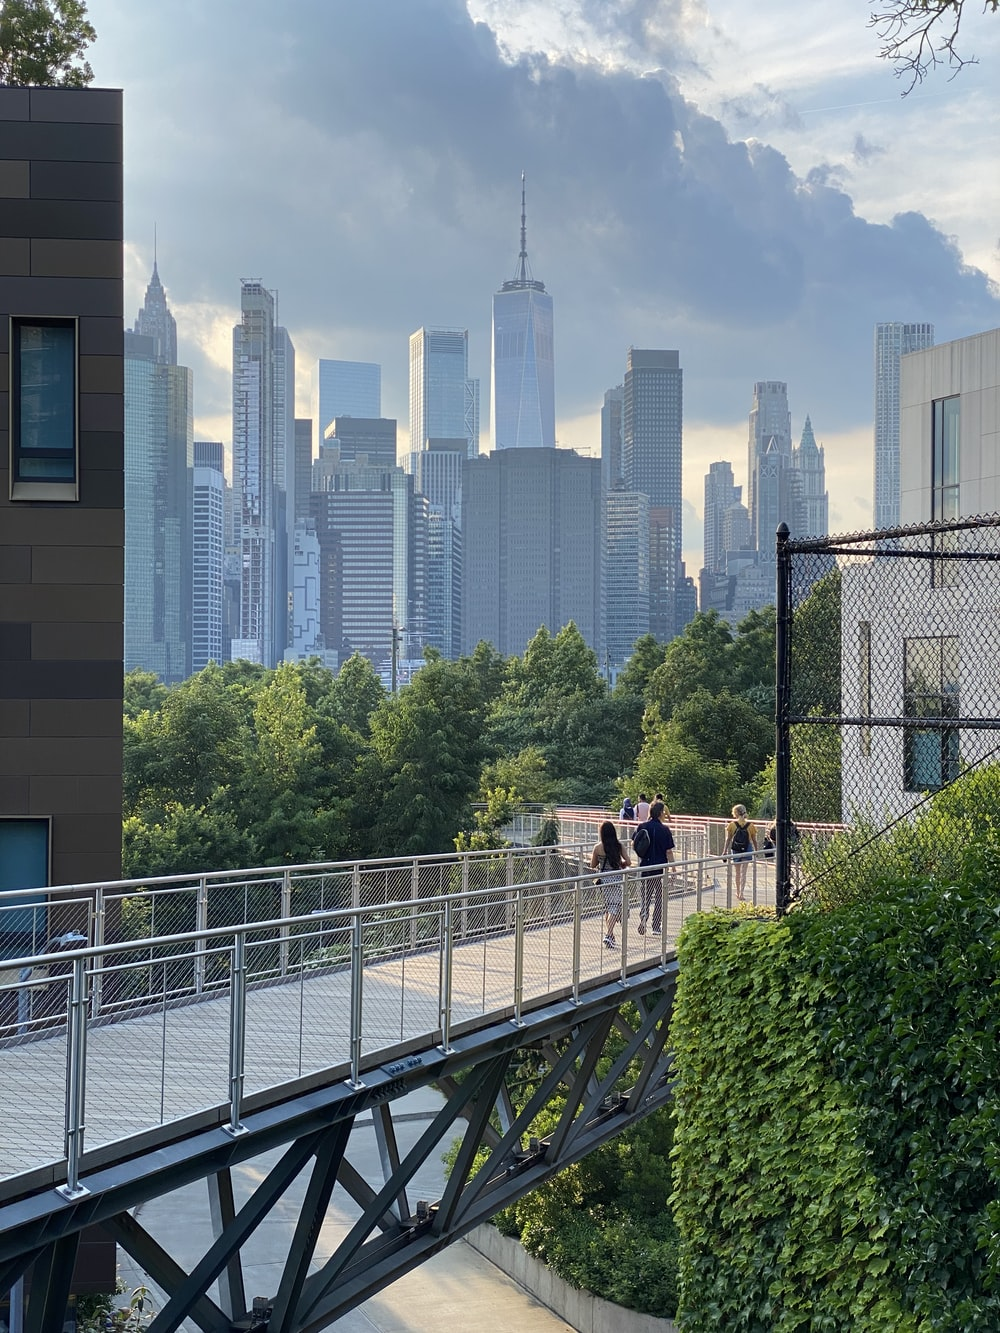 people walking on bridge near high rise buildings during daytime